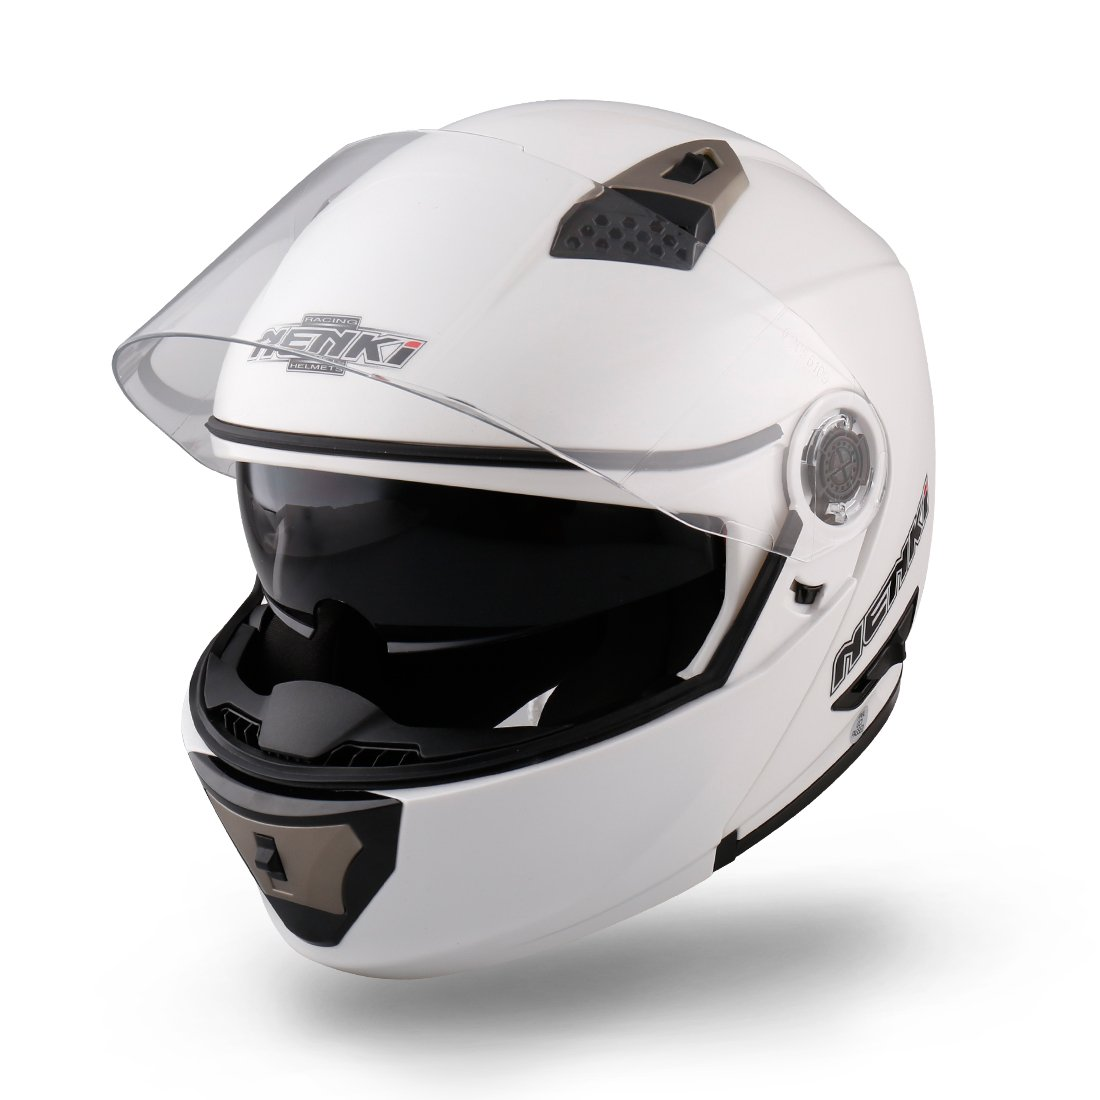 NENKI NK-860 Motorbike Helmet Motorcycle Moped Scooter Flip Up Modular Crash Helmets S, Hi Viz